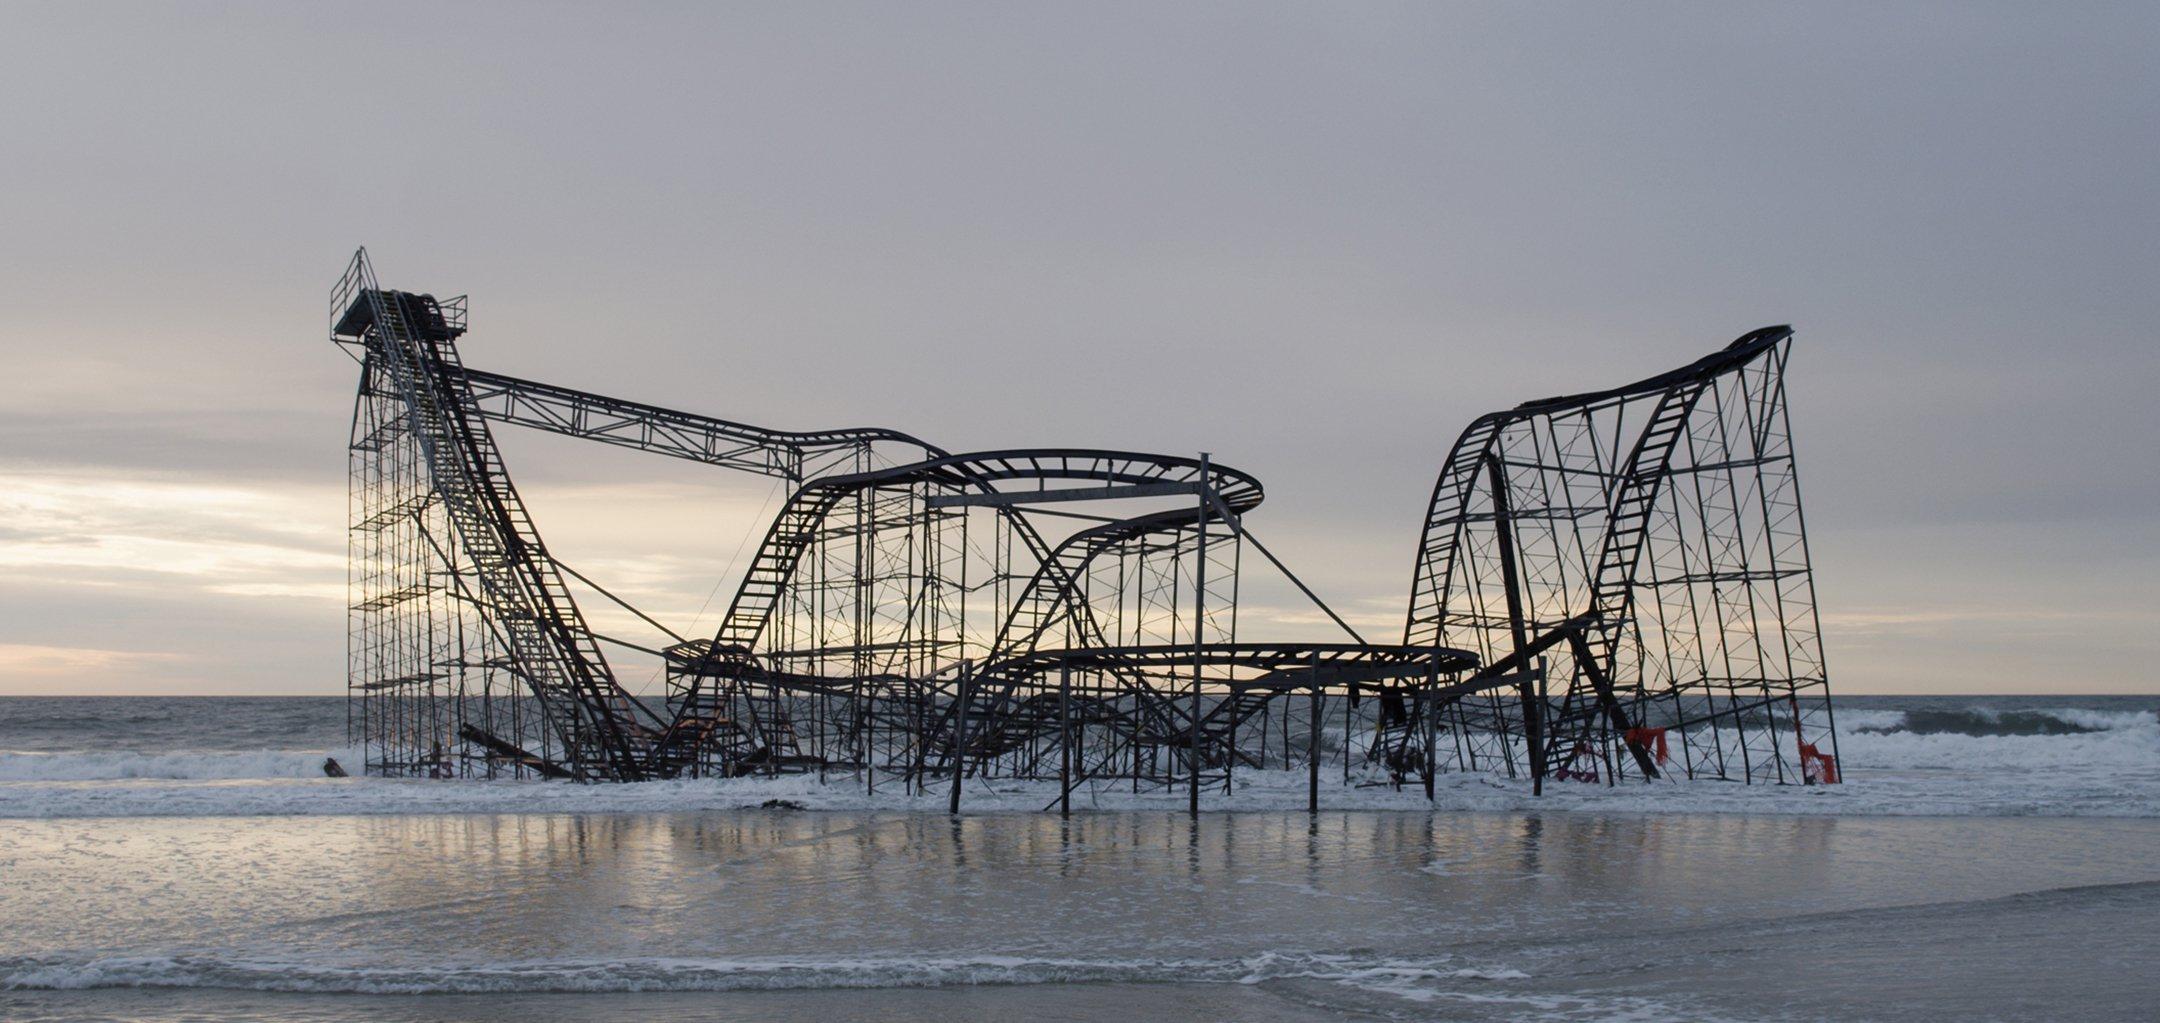 A derelict rollercoaster on a beach in a still from 'Homo Sapiens' (2016)